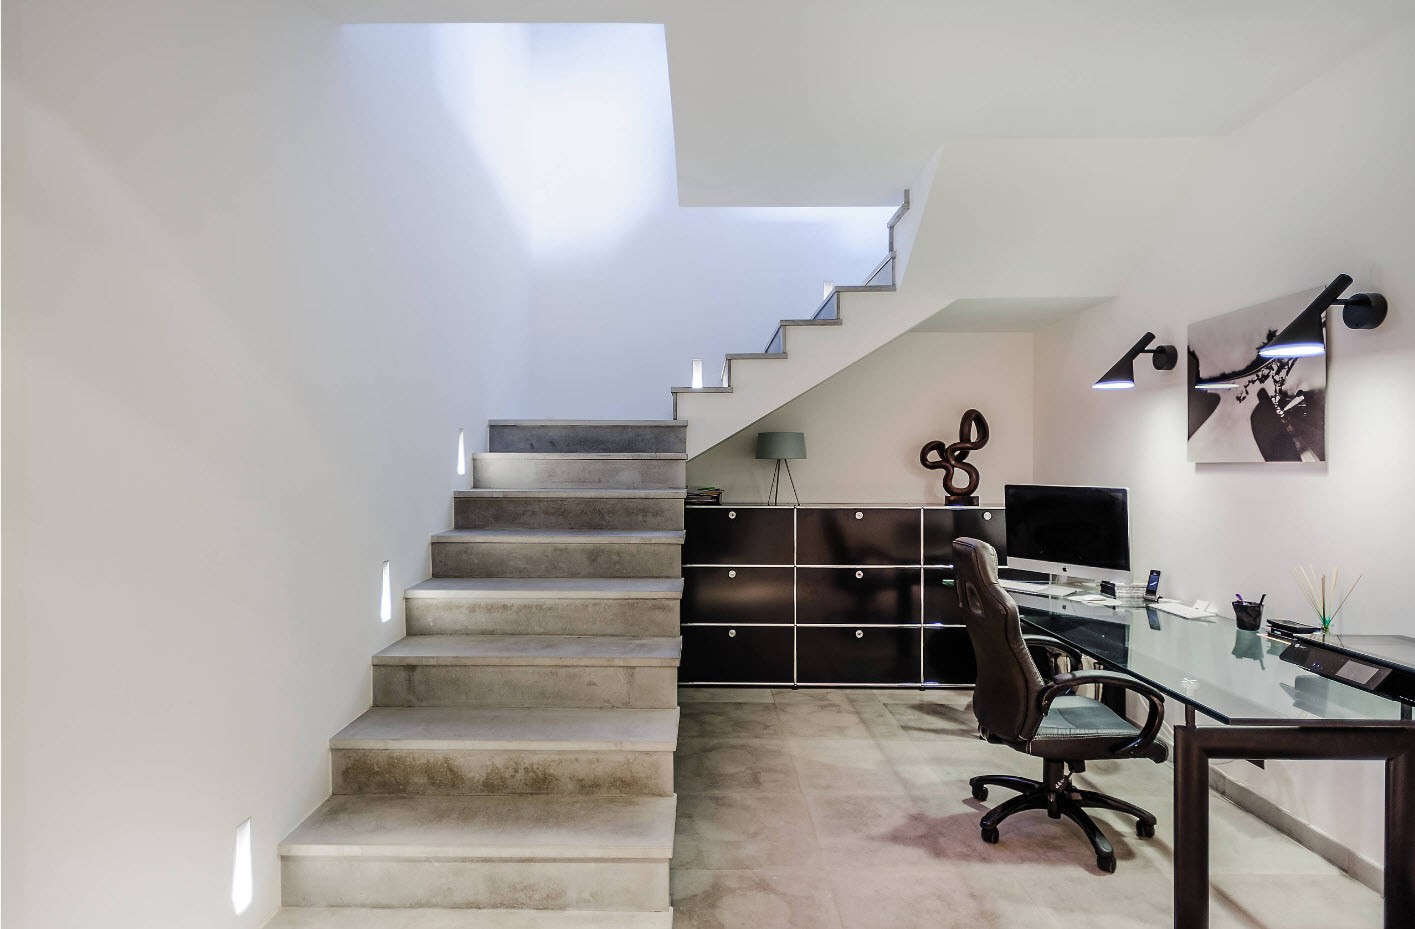 Офис под лестницей